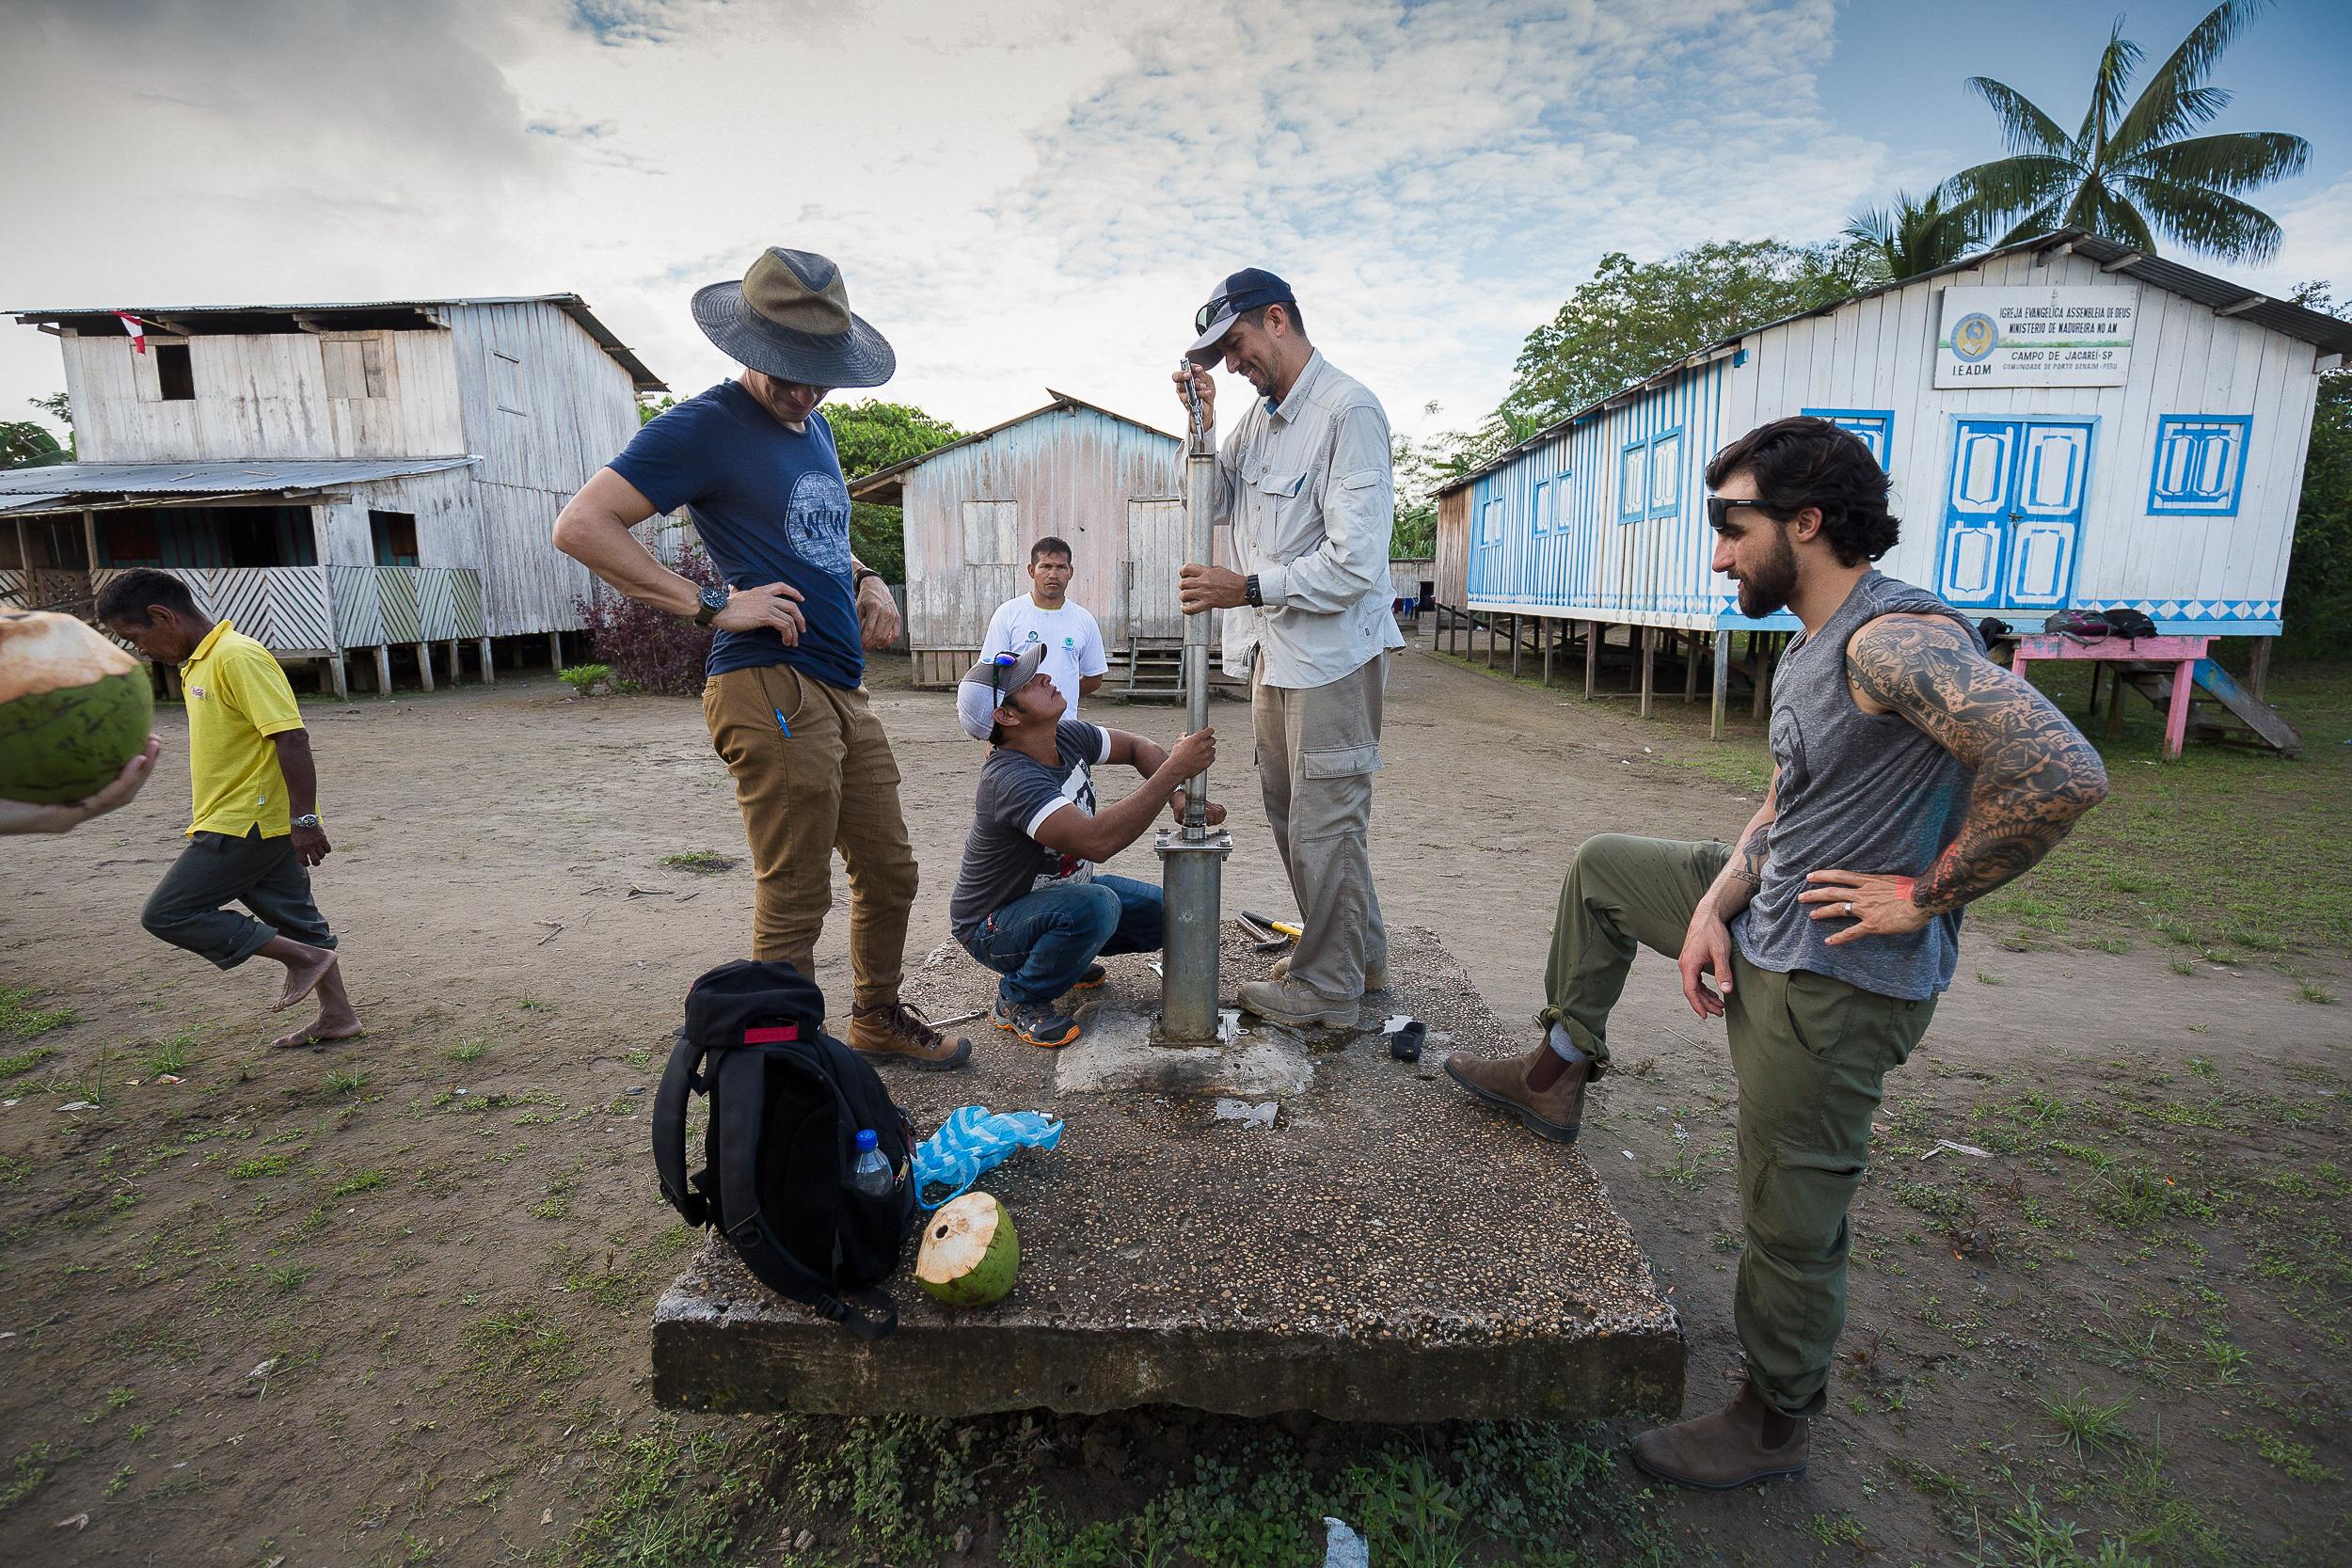 Field Technicians Gustavo (center left) and Gonzalo Jimenez (center right) repair a broken well.